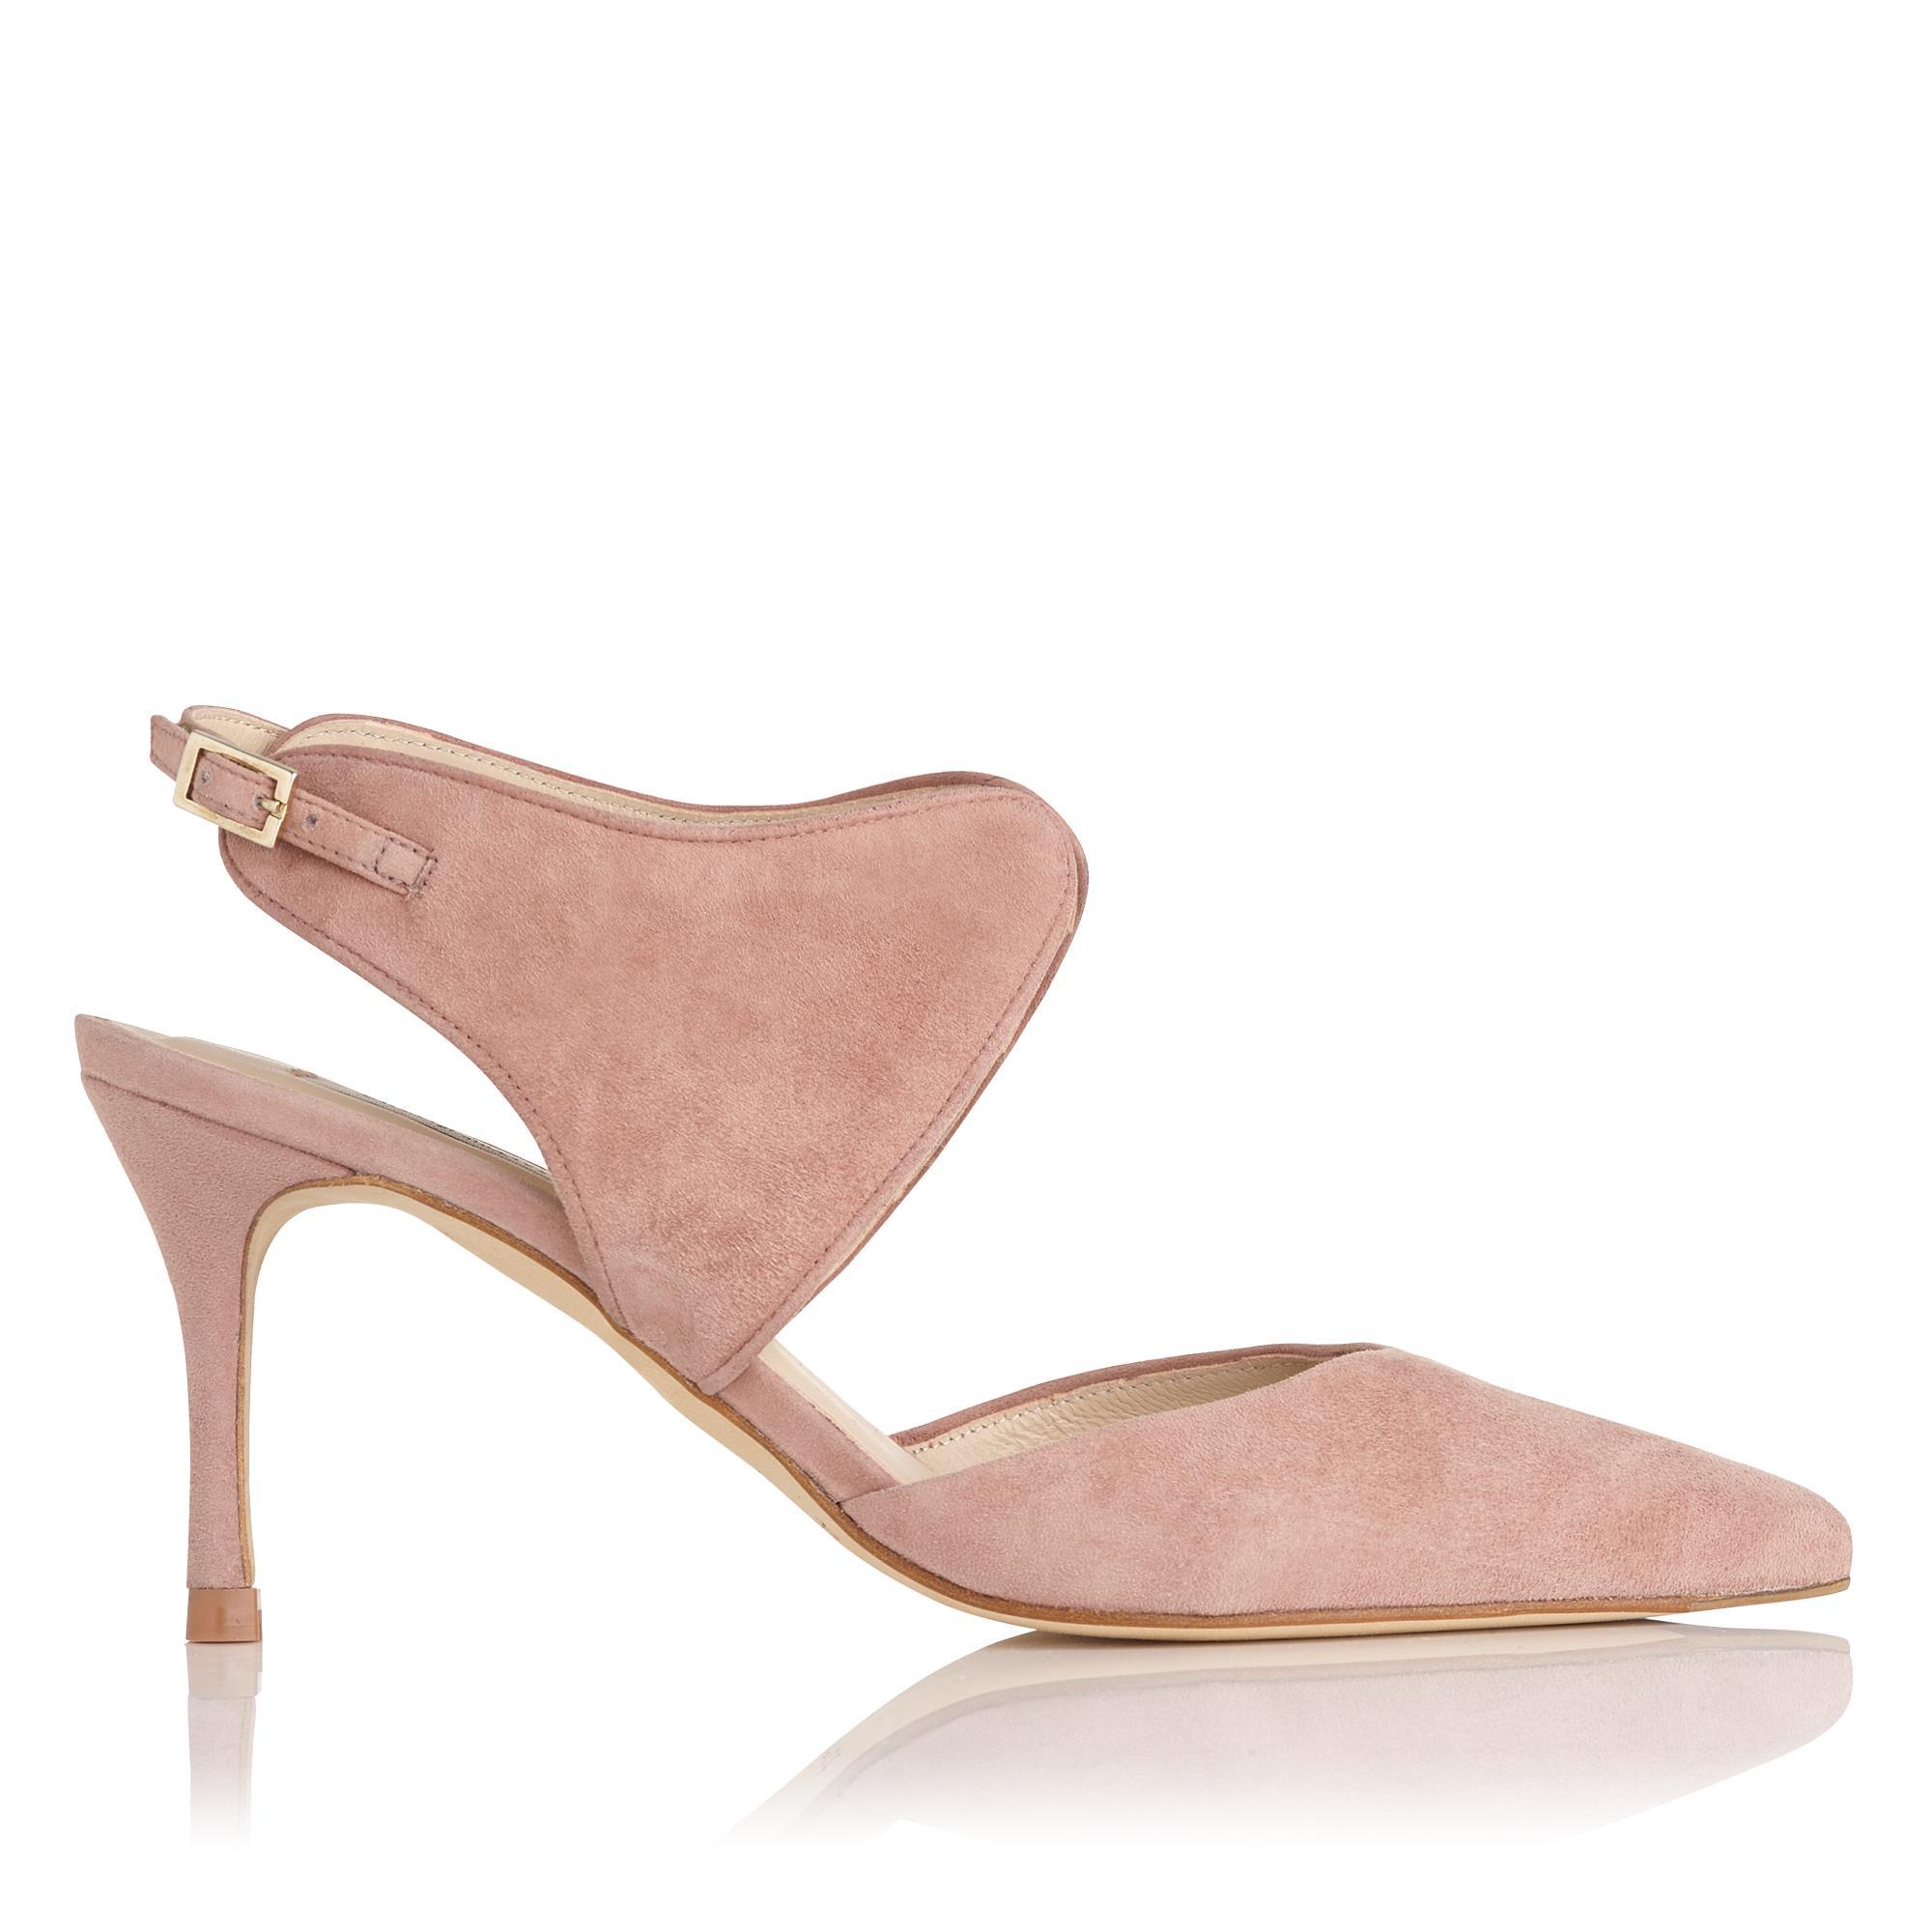 Cecily Pink Suede Heel